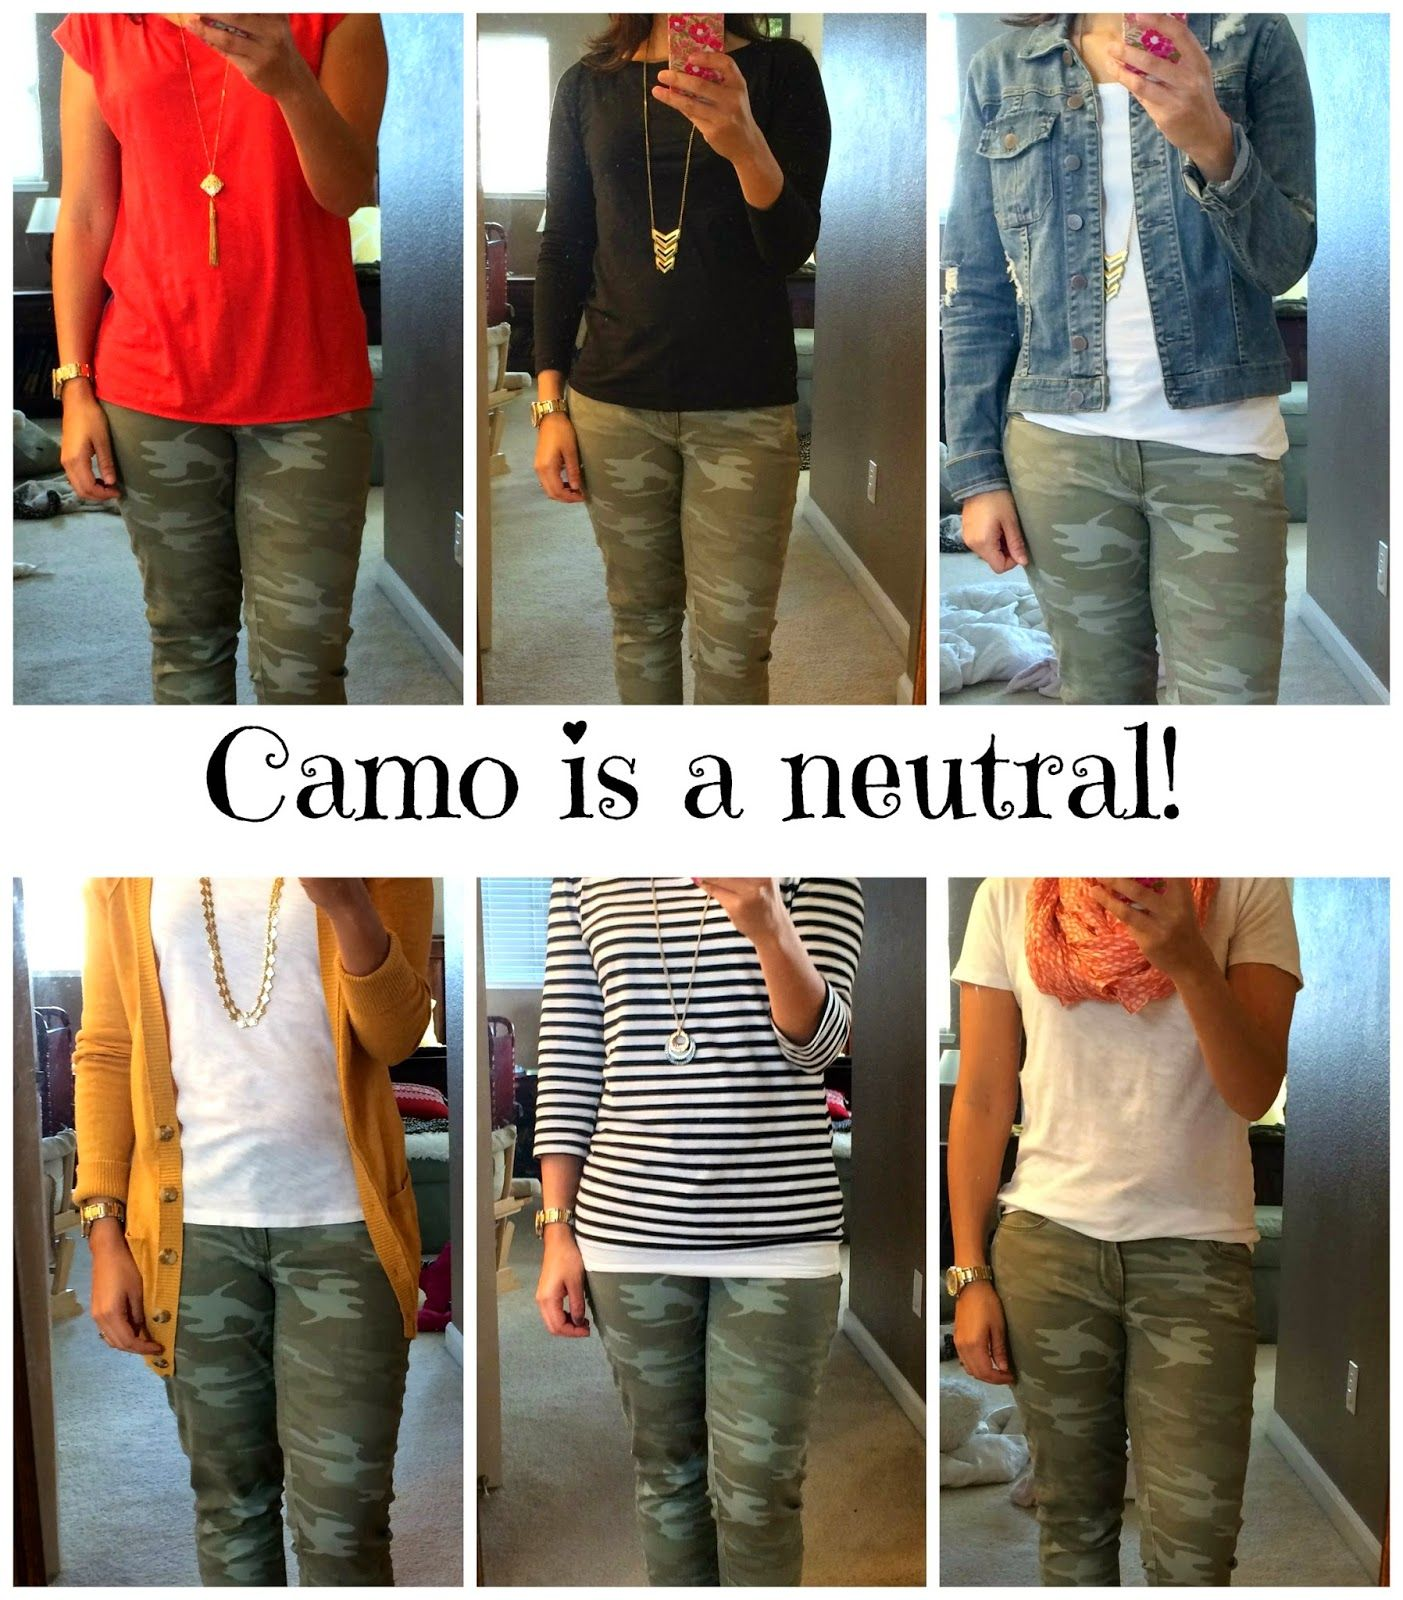 b60ea3f13766c Camo Jeans Outfit, Camo Skinnies, Camo Skinny Jeans, Camo Outfits, Jean  Outfits